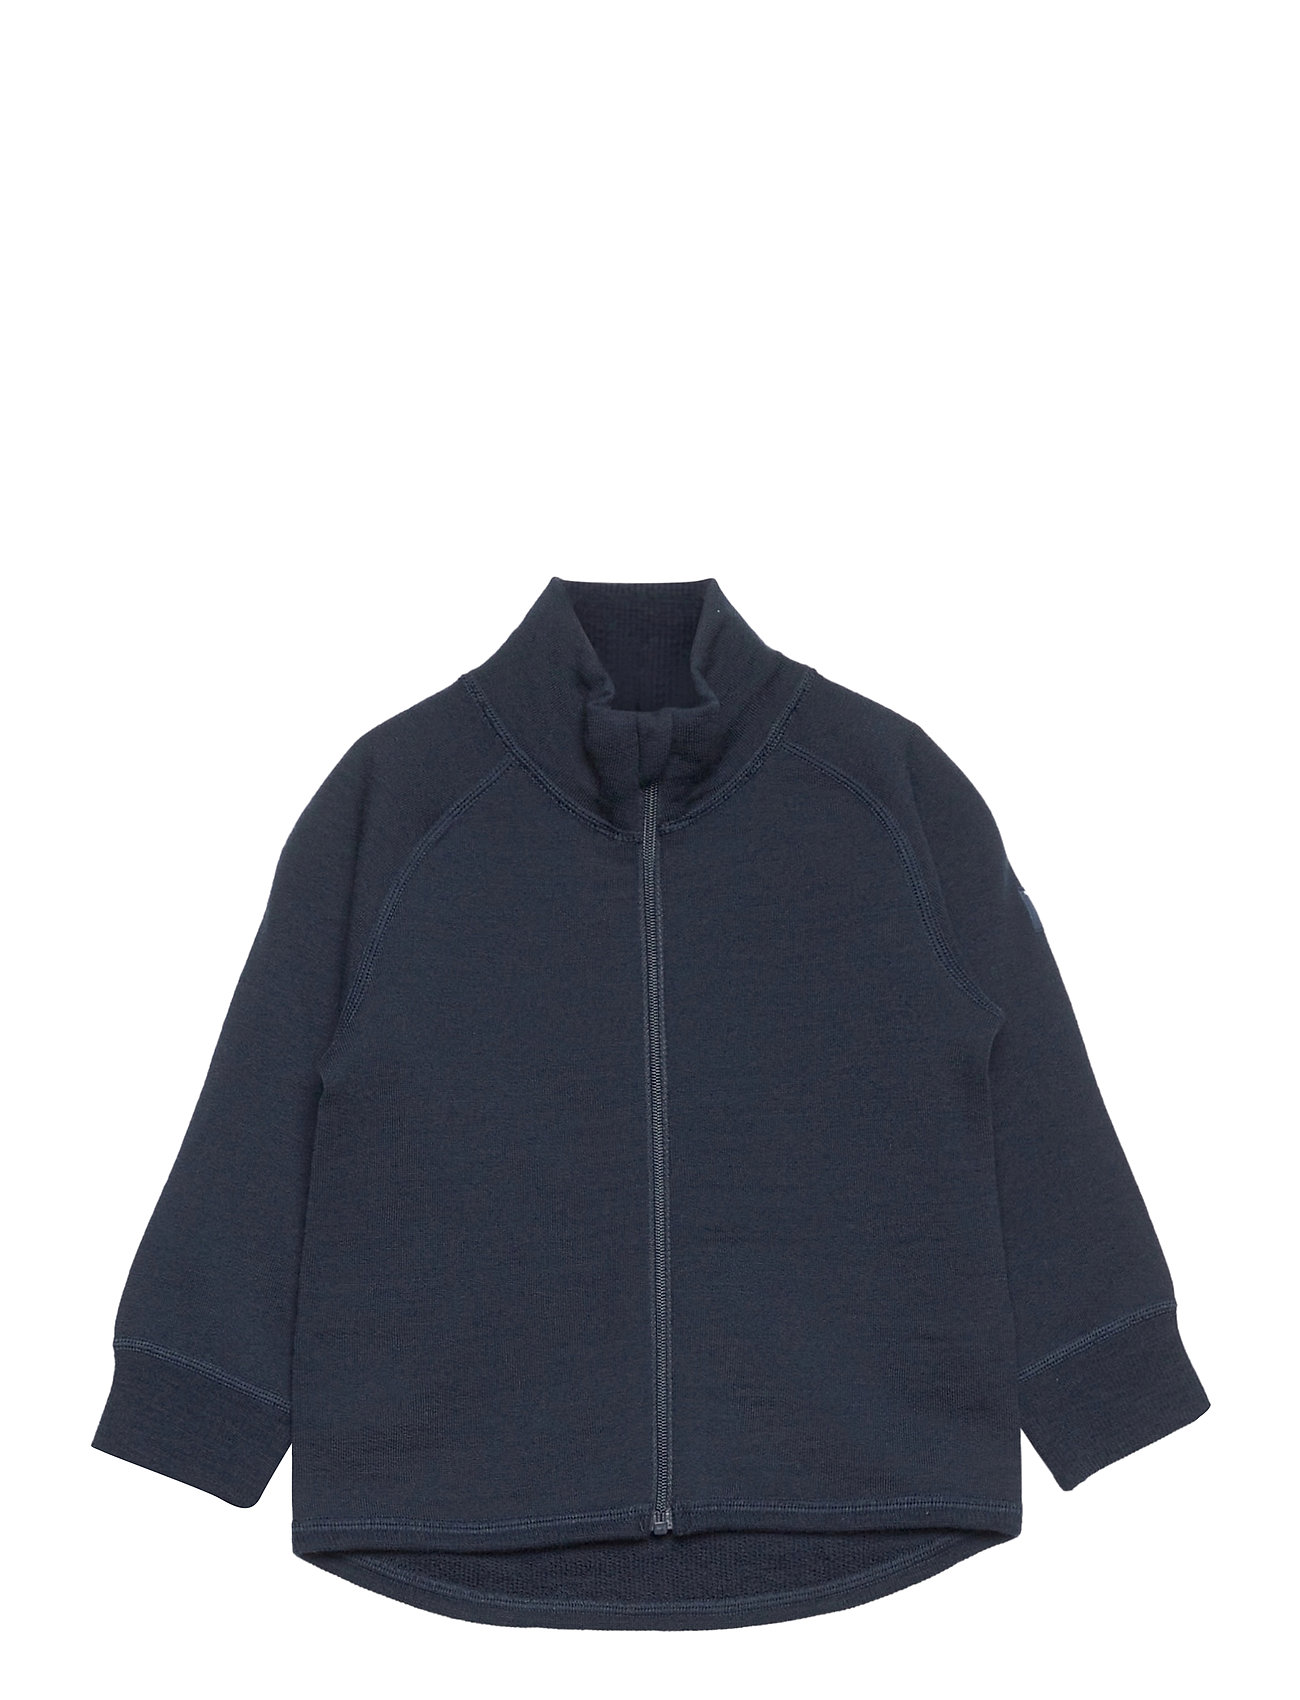 Image of Zip Up Woolterry Prechool Outerwear Wool Outerwear Blå Polarn O. Pyret (3461524635)